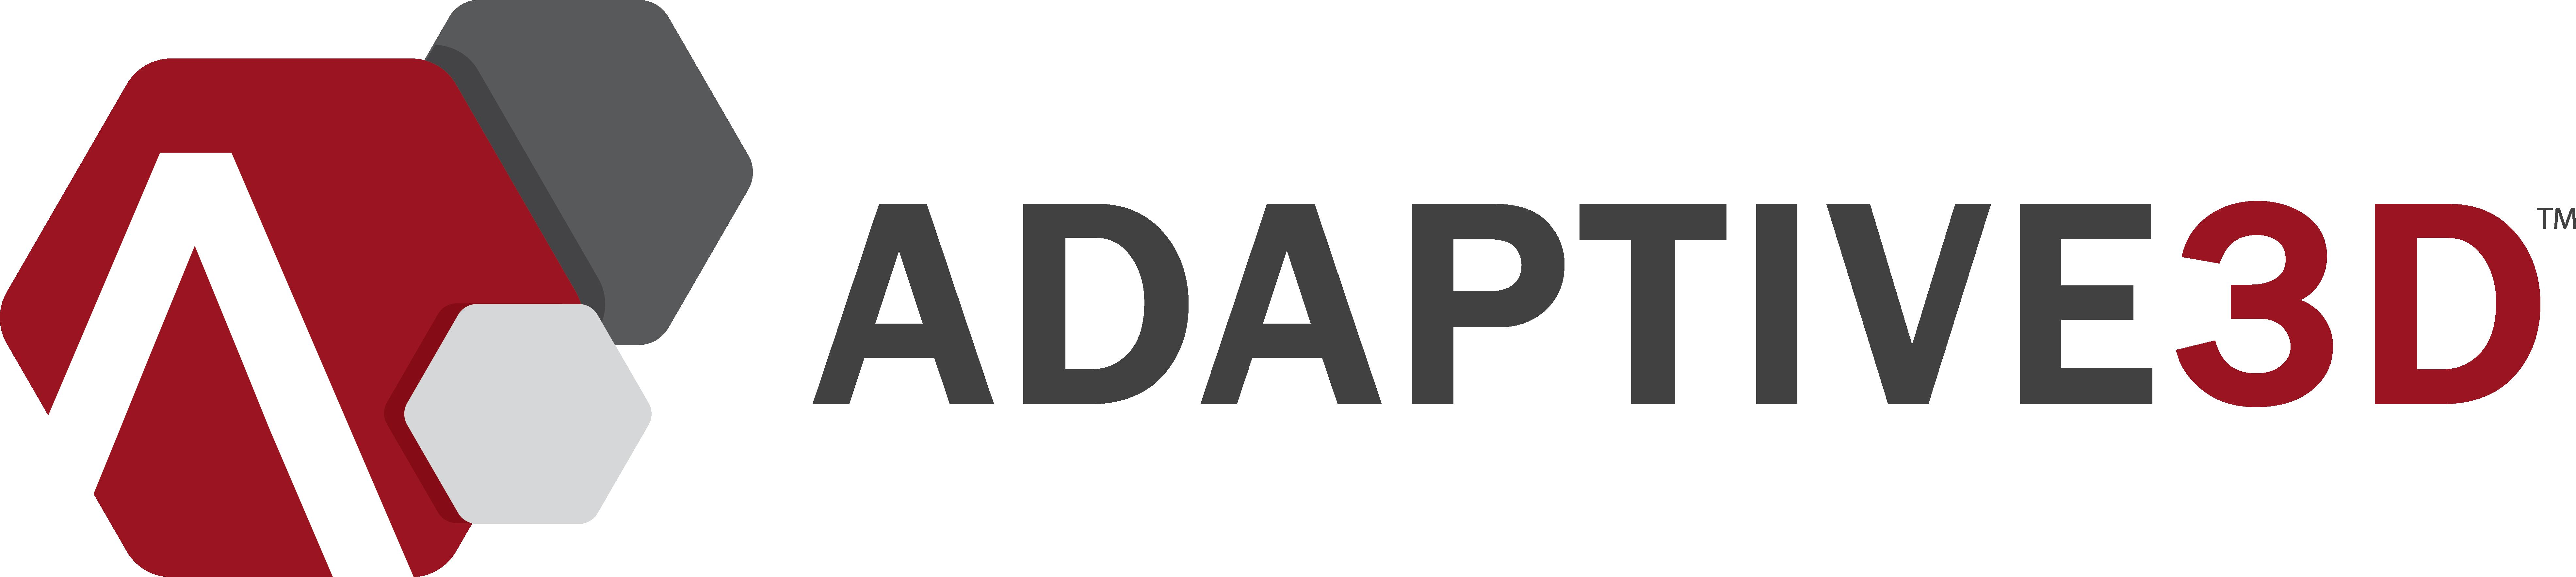 Adaptive3D Technologies